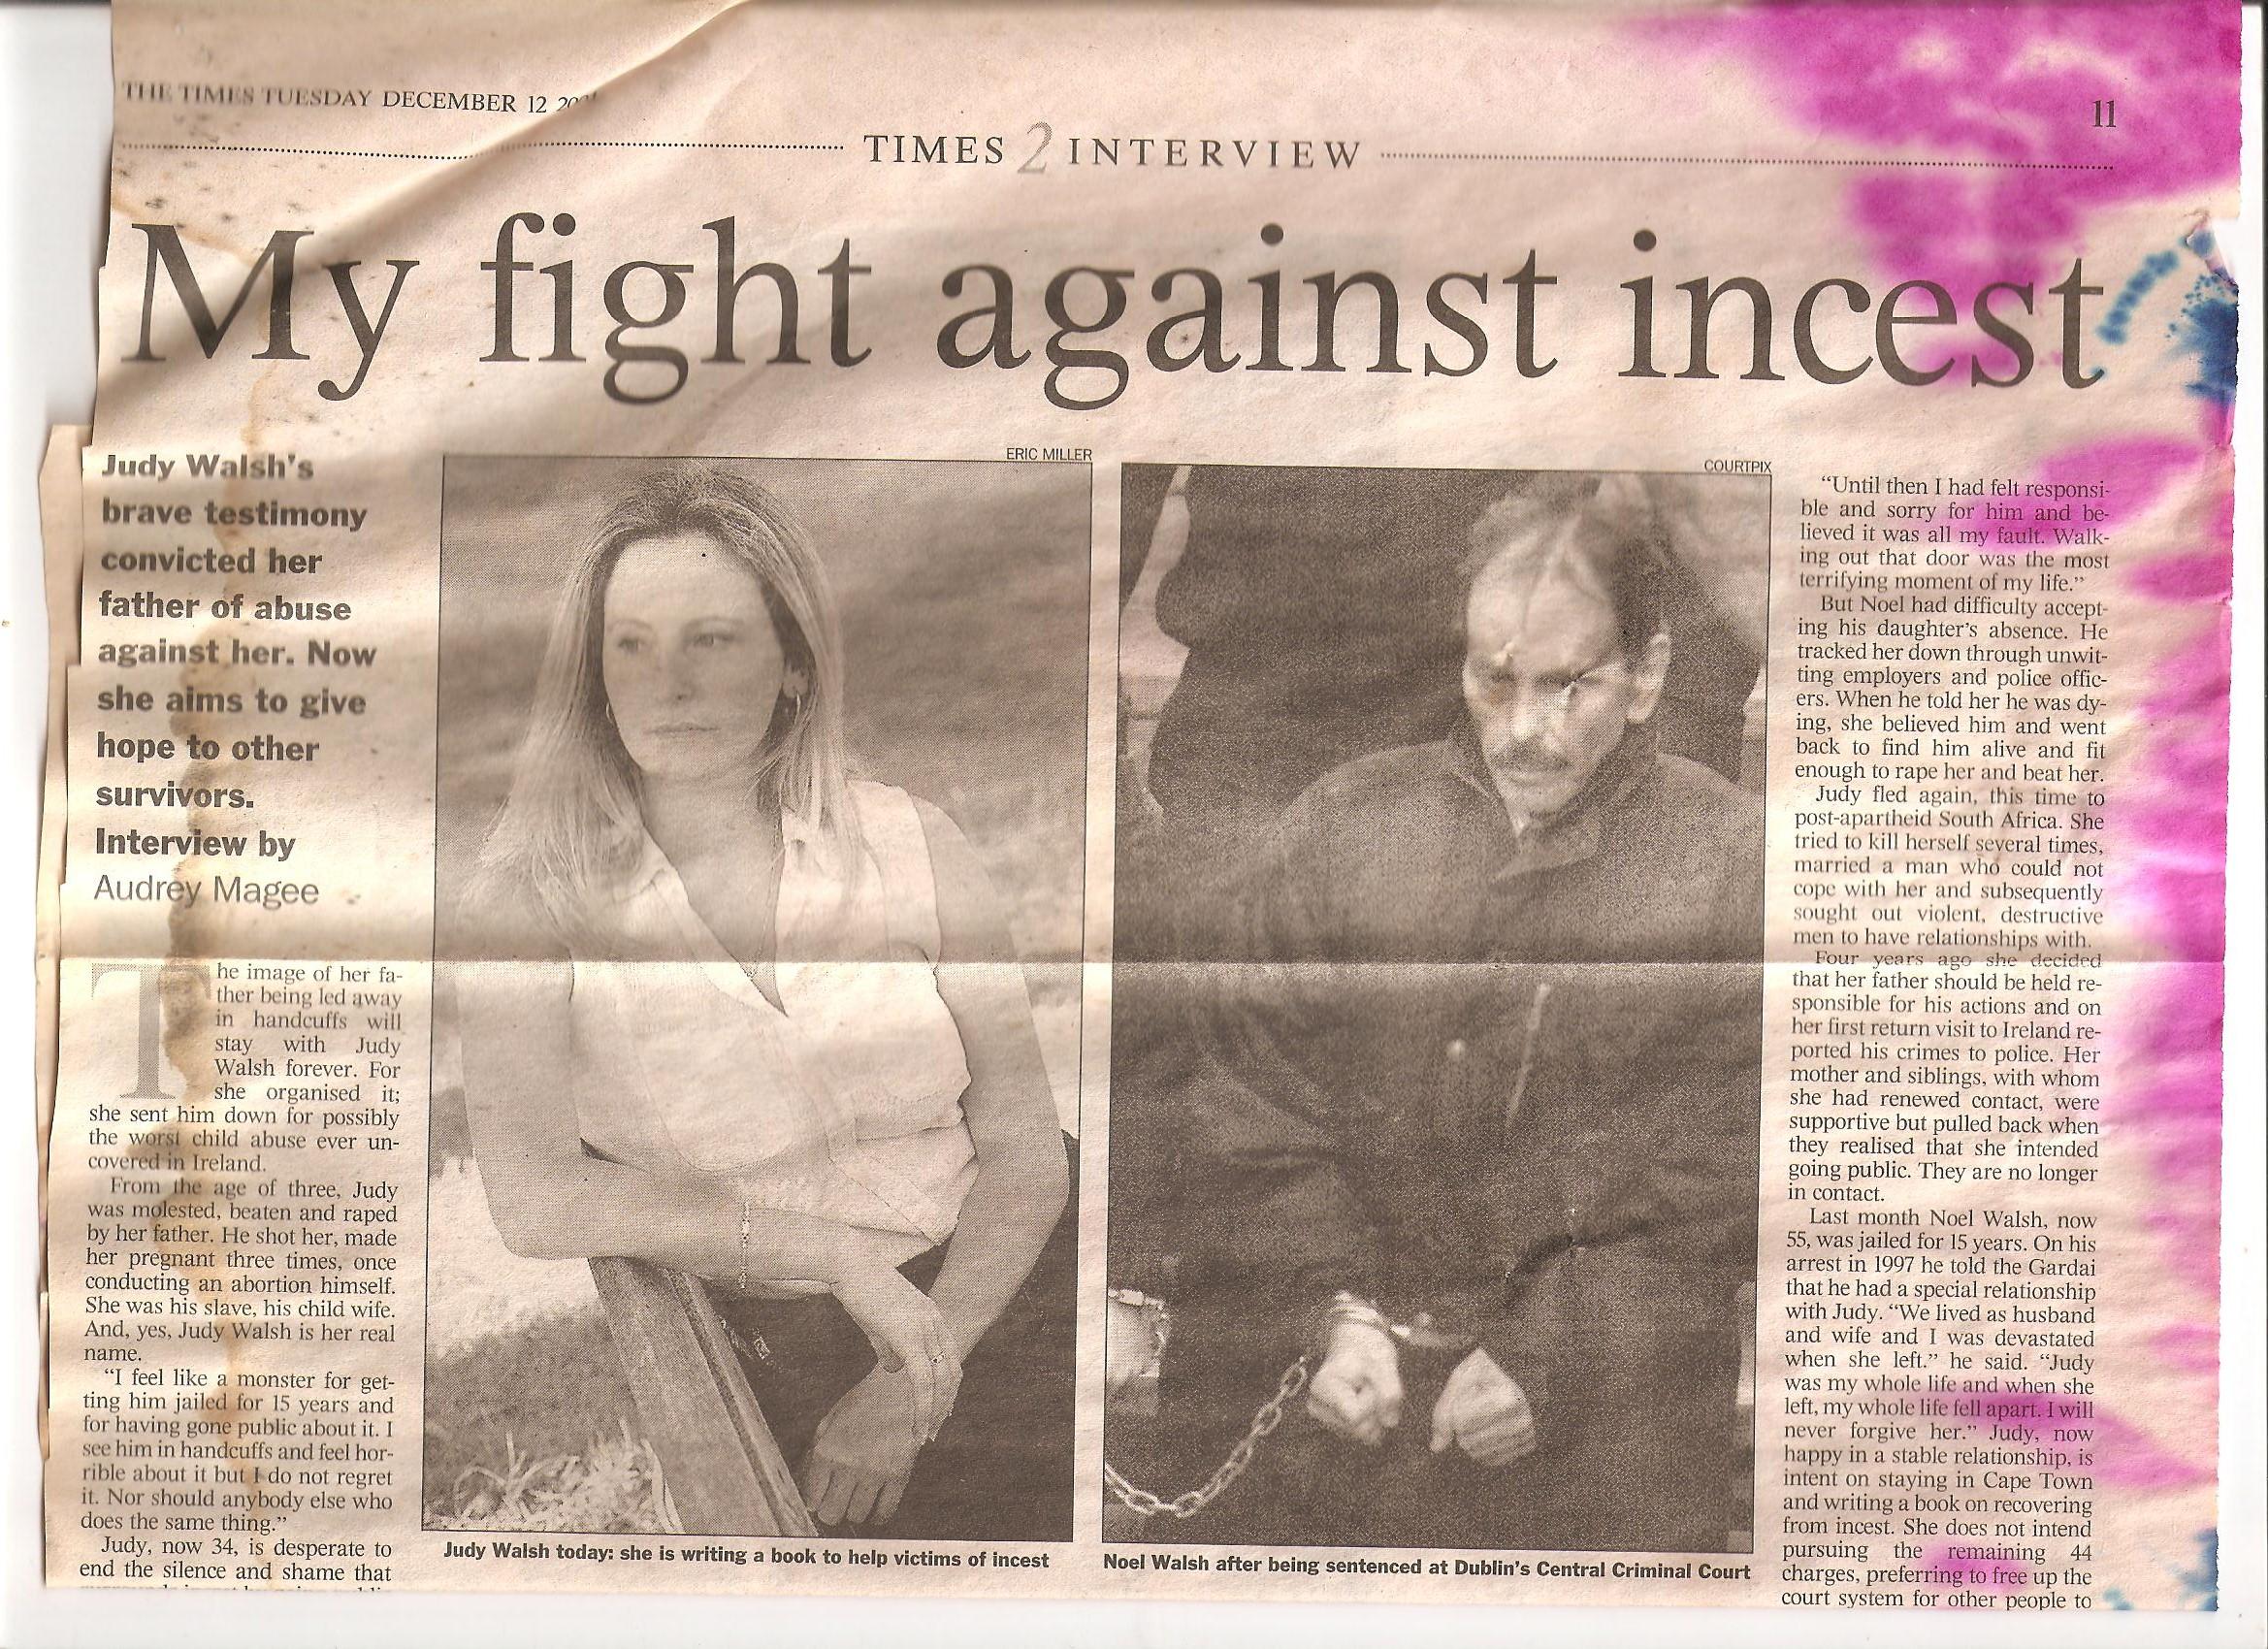 Irish Times Dec12 2000 page 1